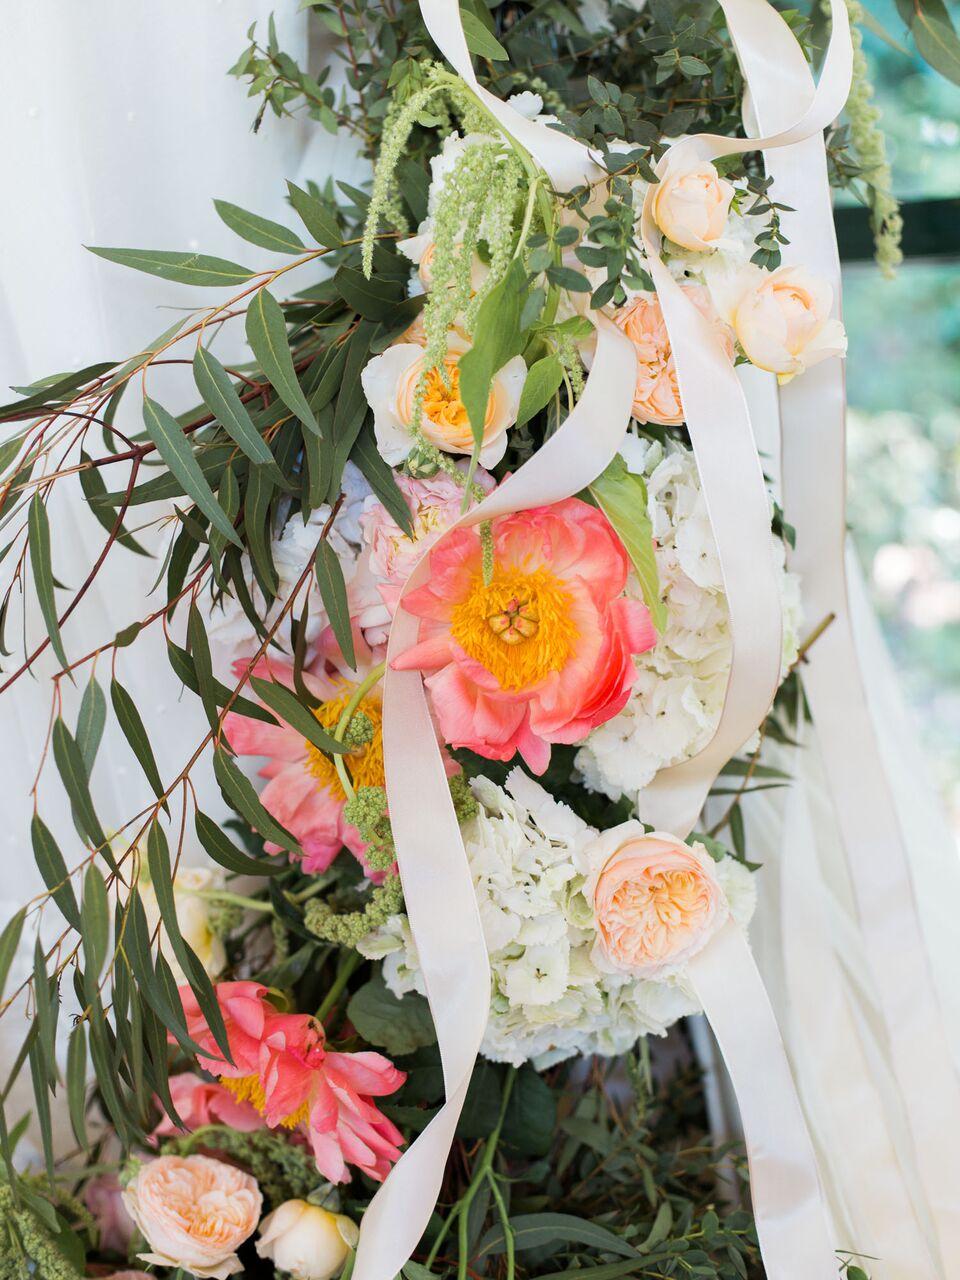 Si-Quiero-Wedding-Planner-By-Sira-Antequera-Paola-Pedro-8